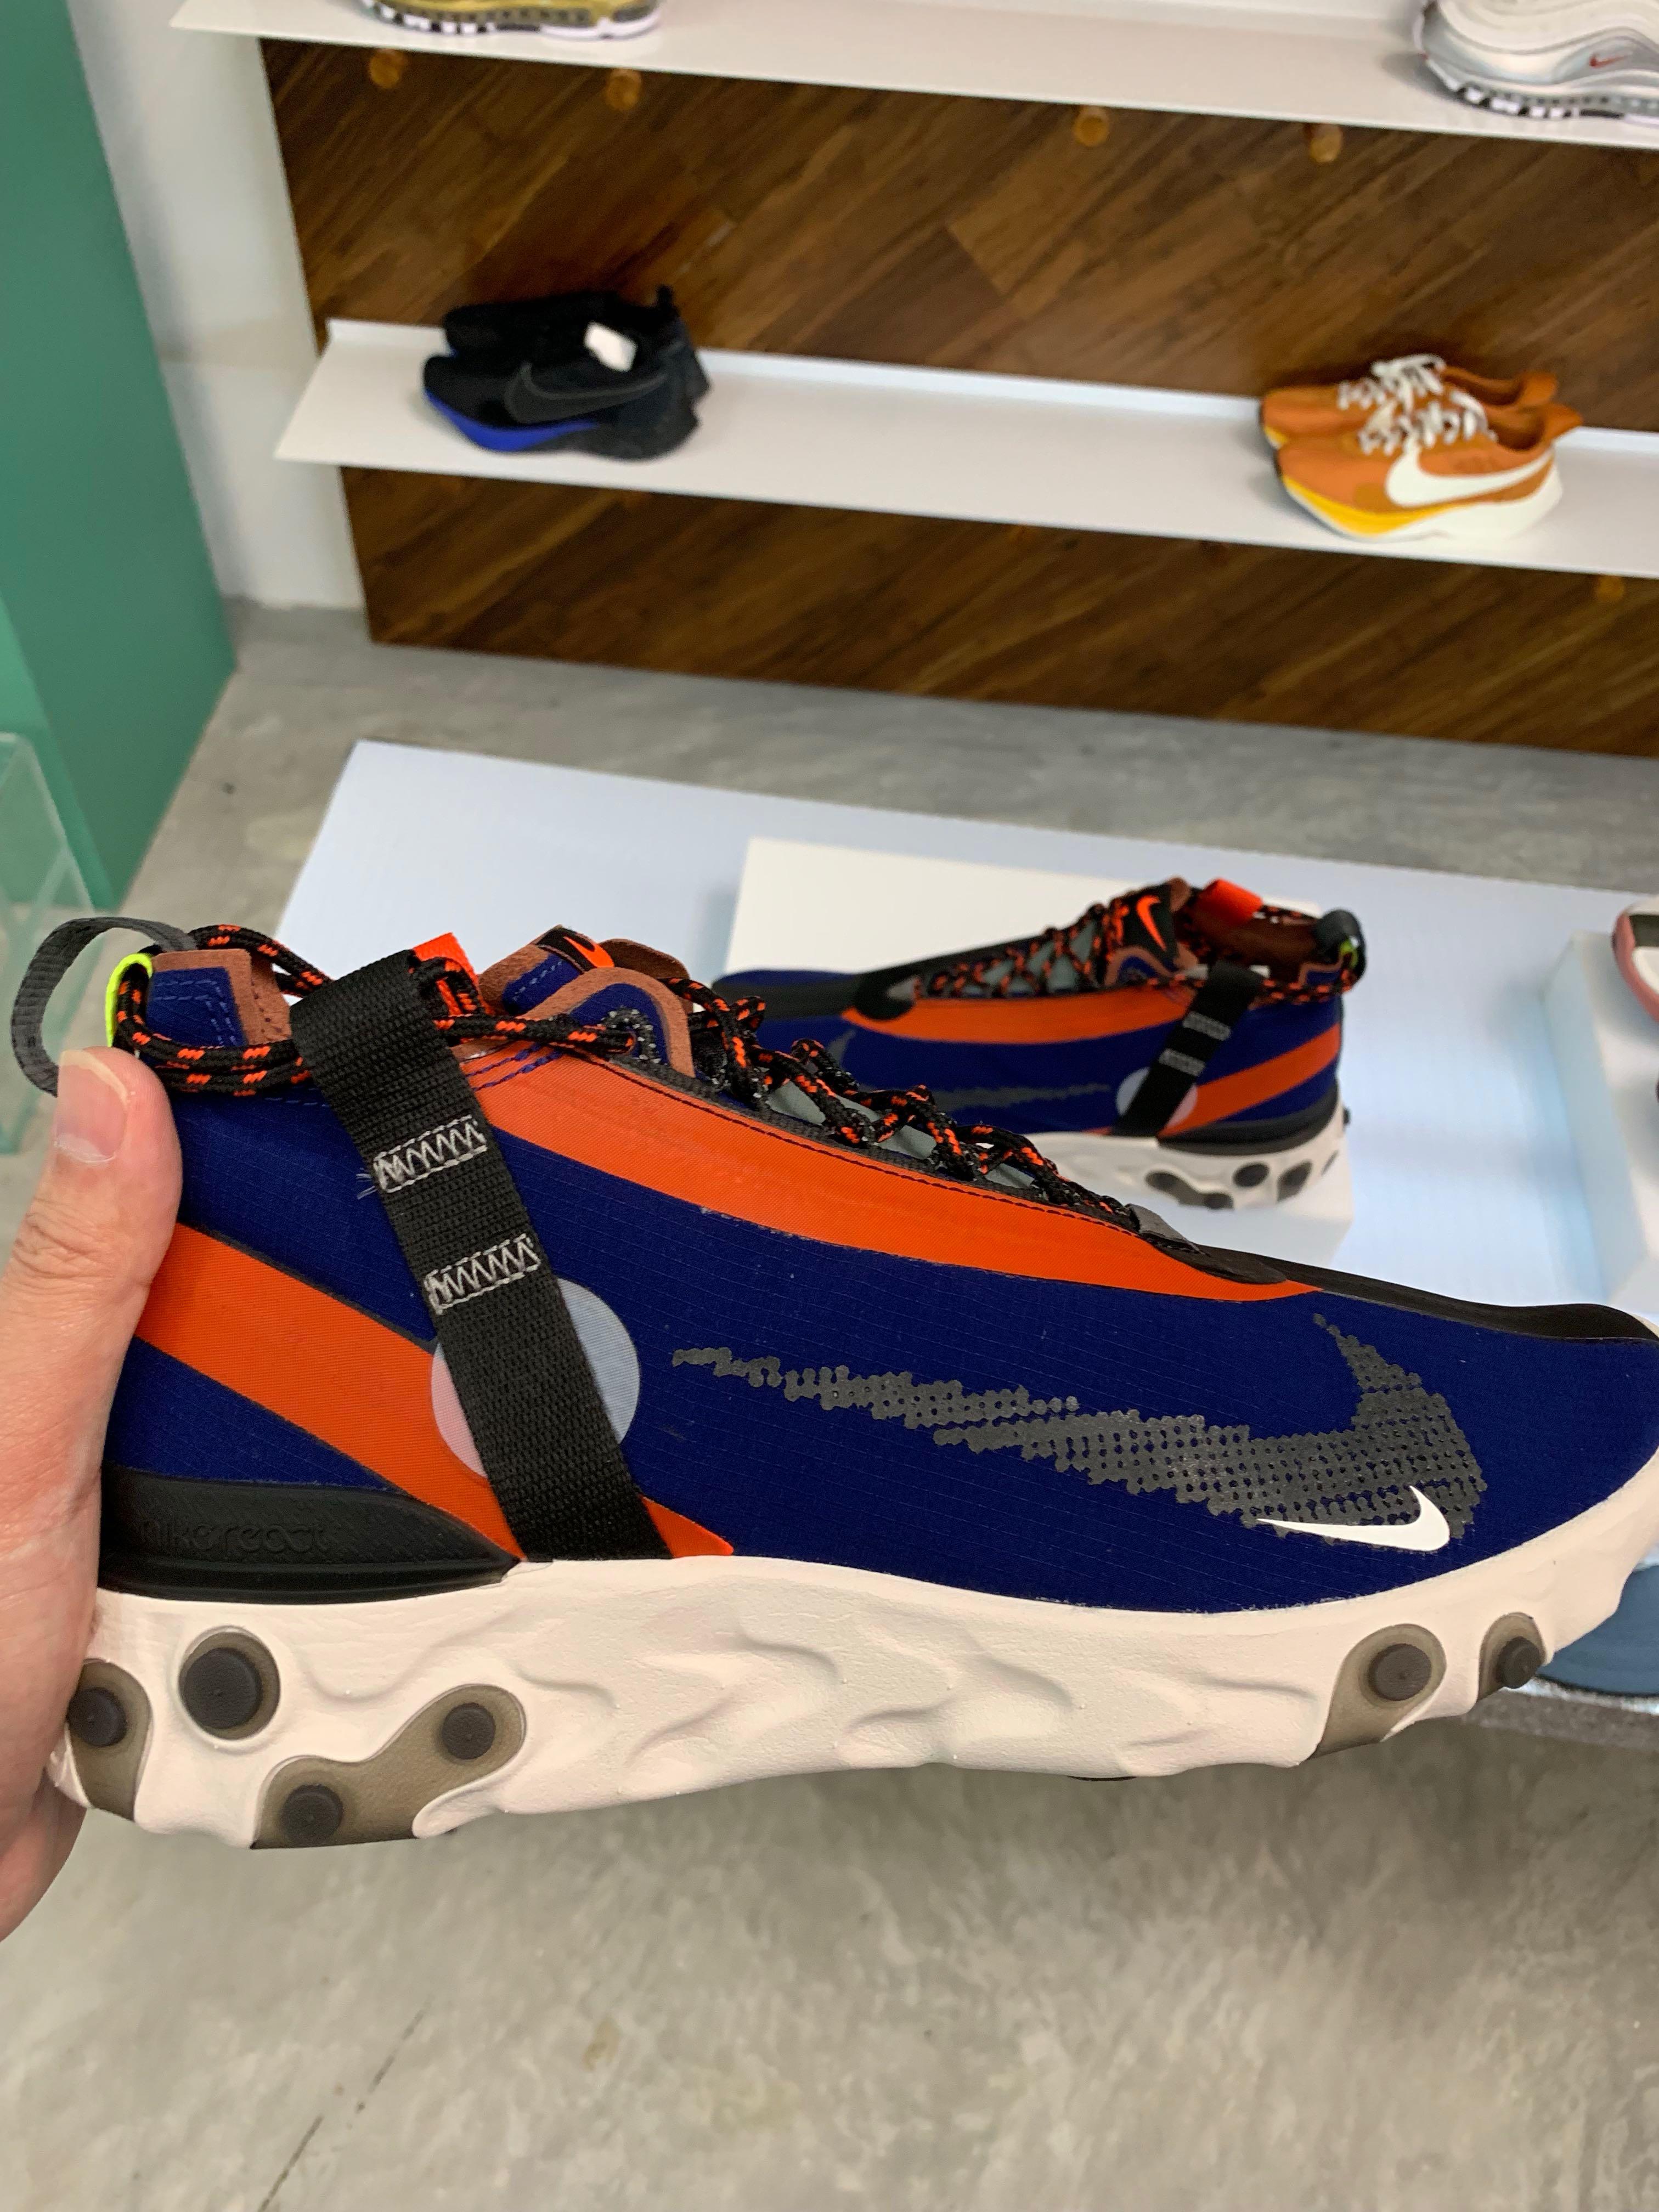 3061758282826 NIKE React Runner Mid WR ISPA Ripstop Sneakers